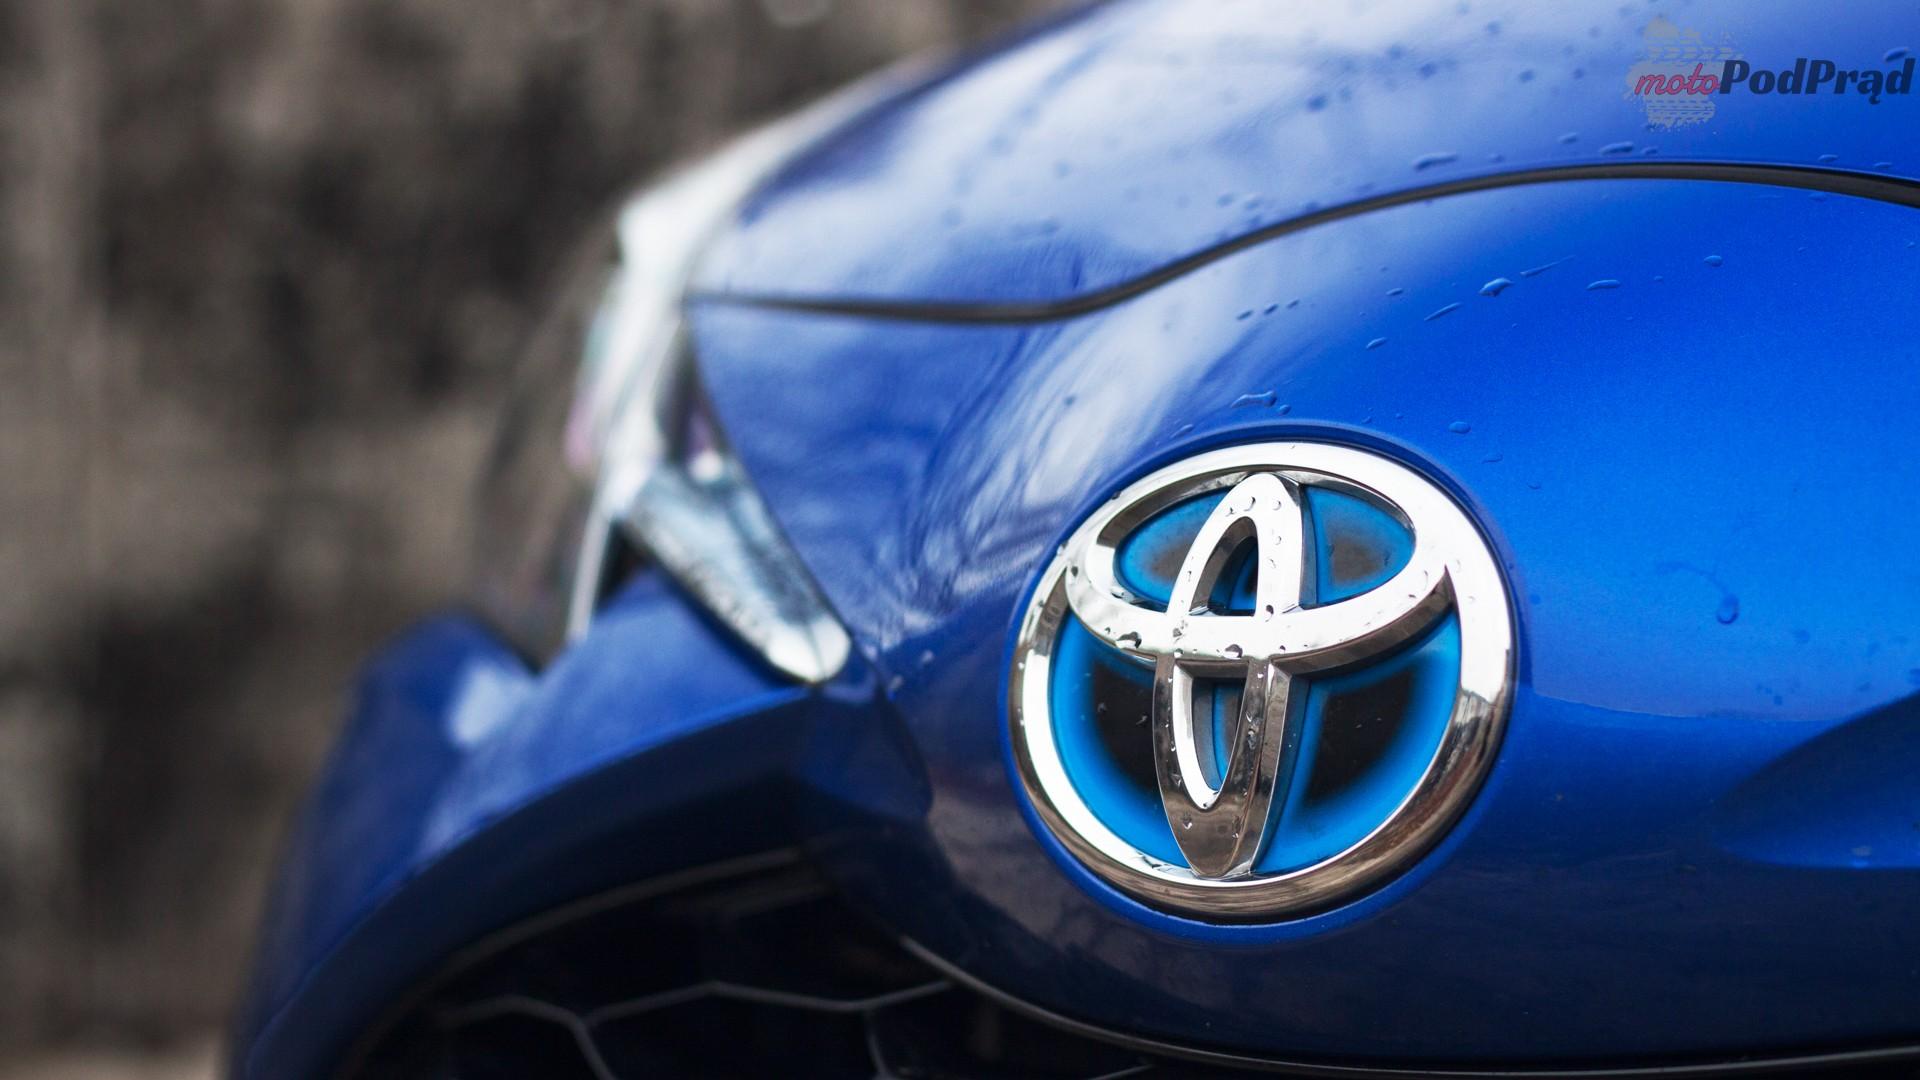 toyota yaris hybrydowa hybrid 2017 selection maska znaczek logo Test: Toyota Yaris Hybrid Selection   chłodna kalkulacja?